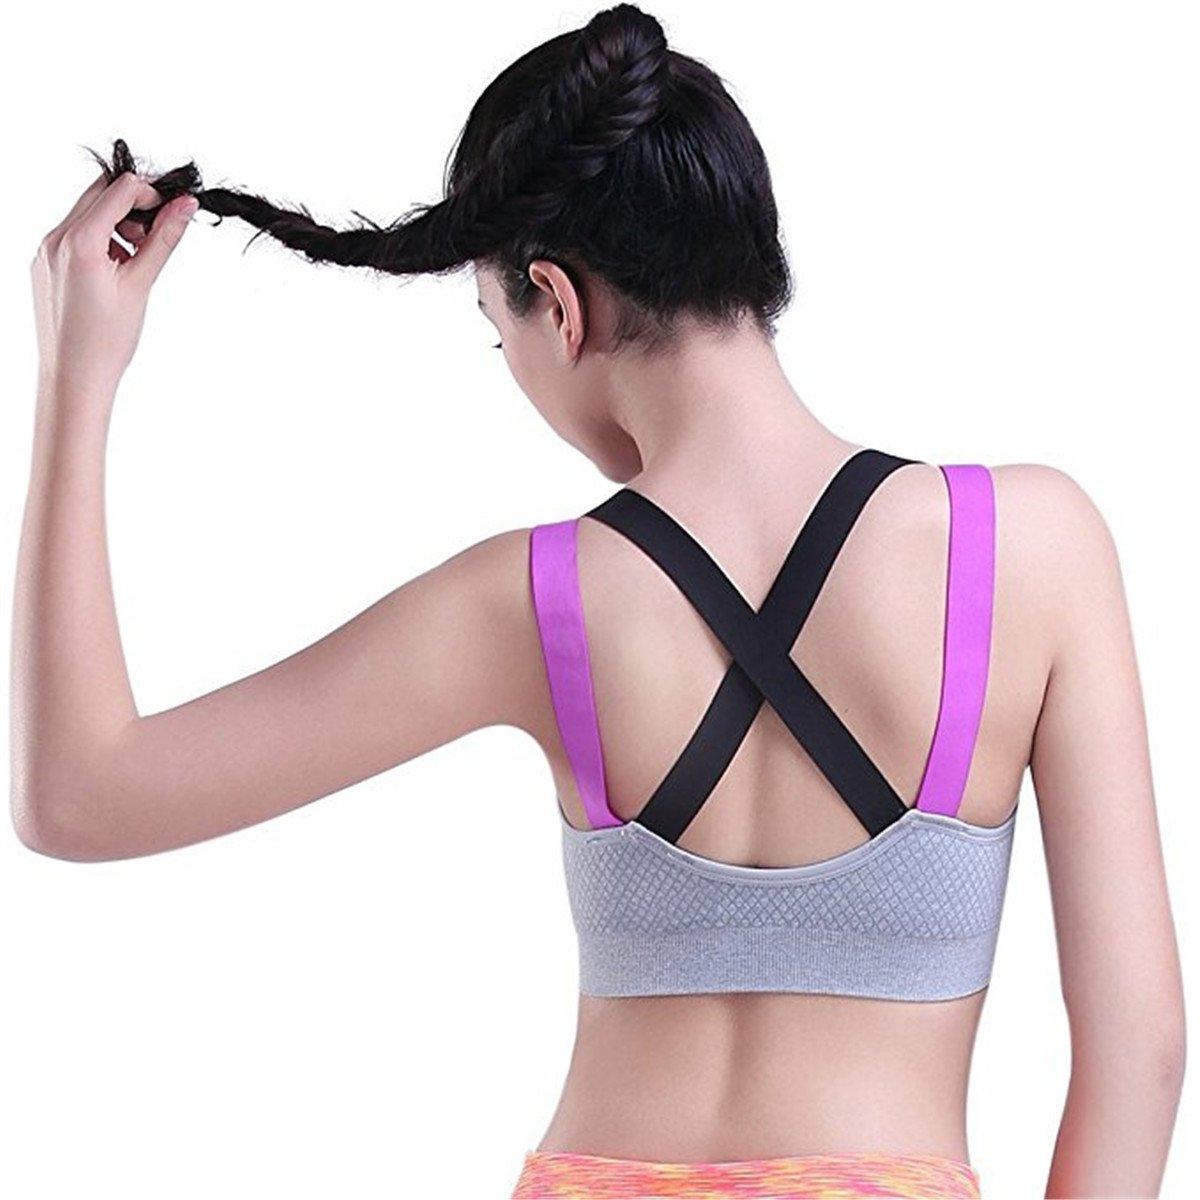 0ac66b9c6 Top 10 wholesale Skin Tone Sports Bra - Chinabrands.com